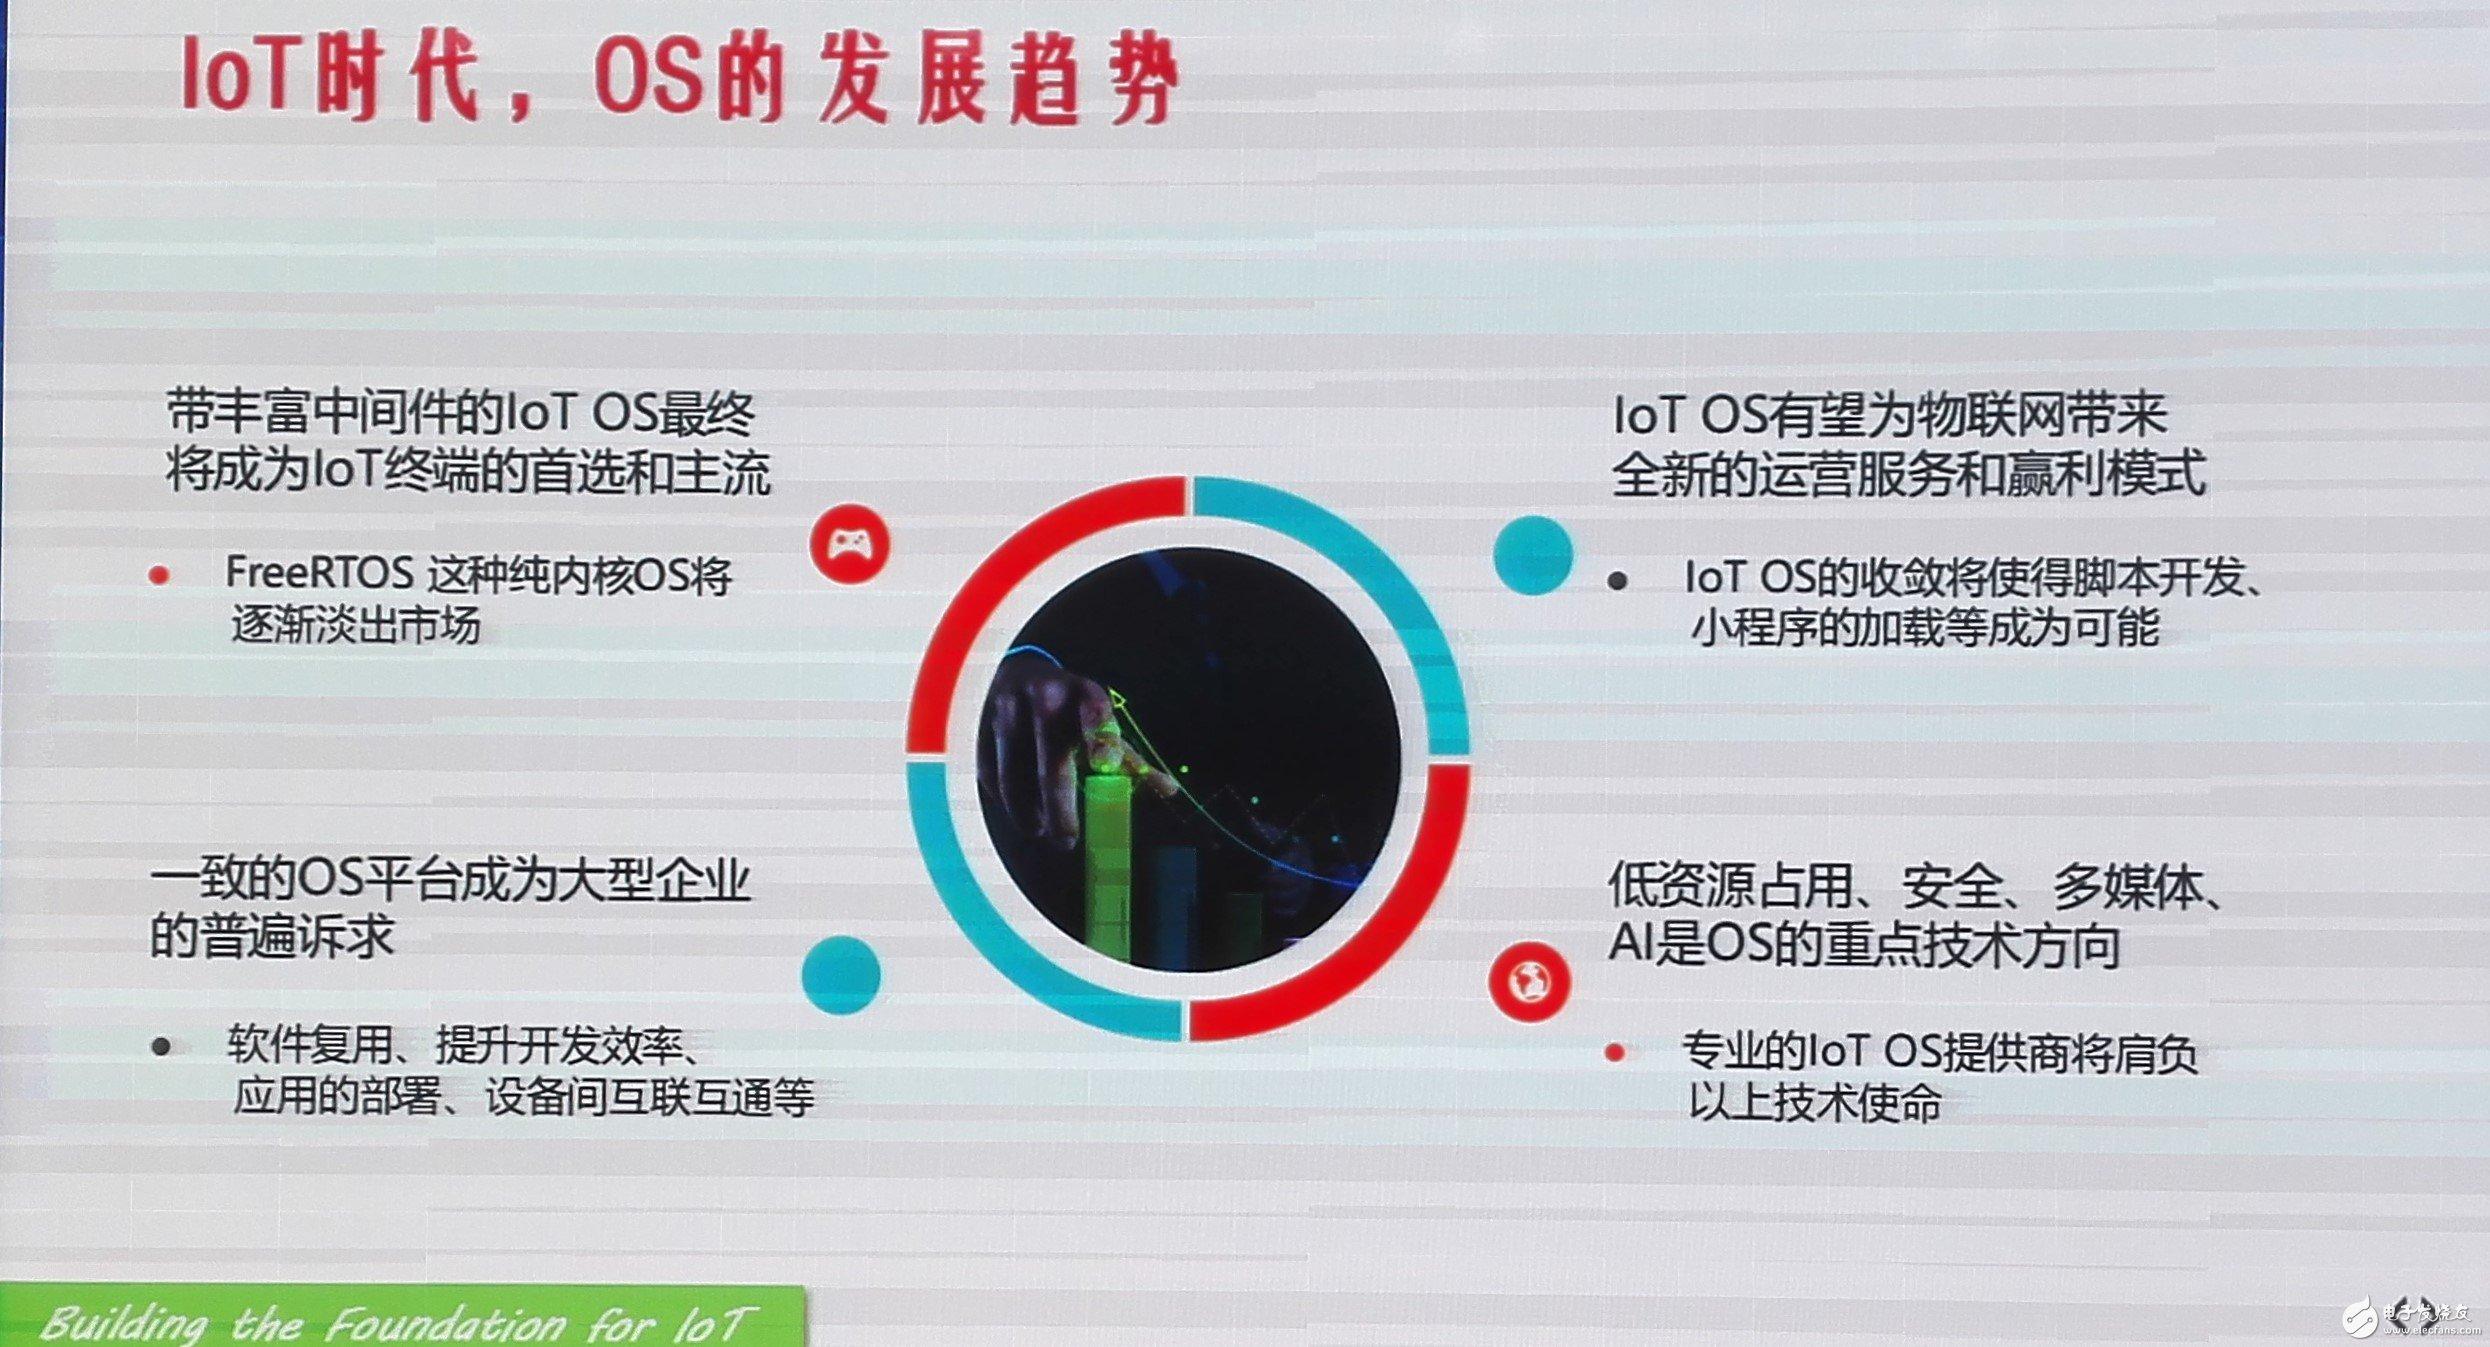 IoT OS的发展趋势